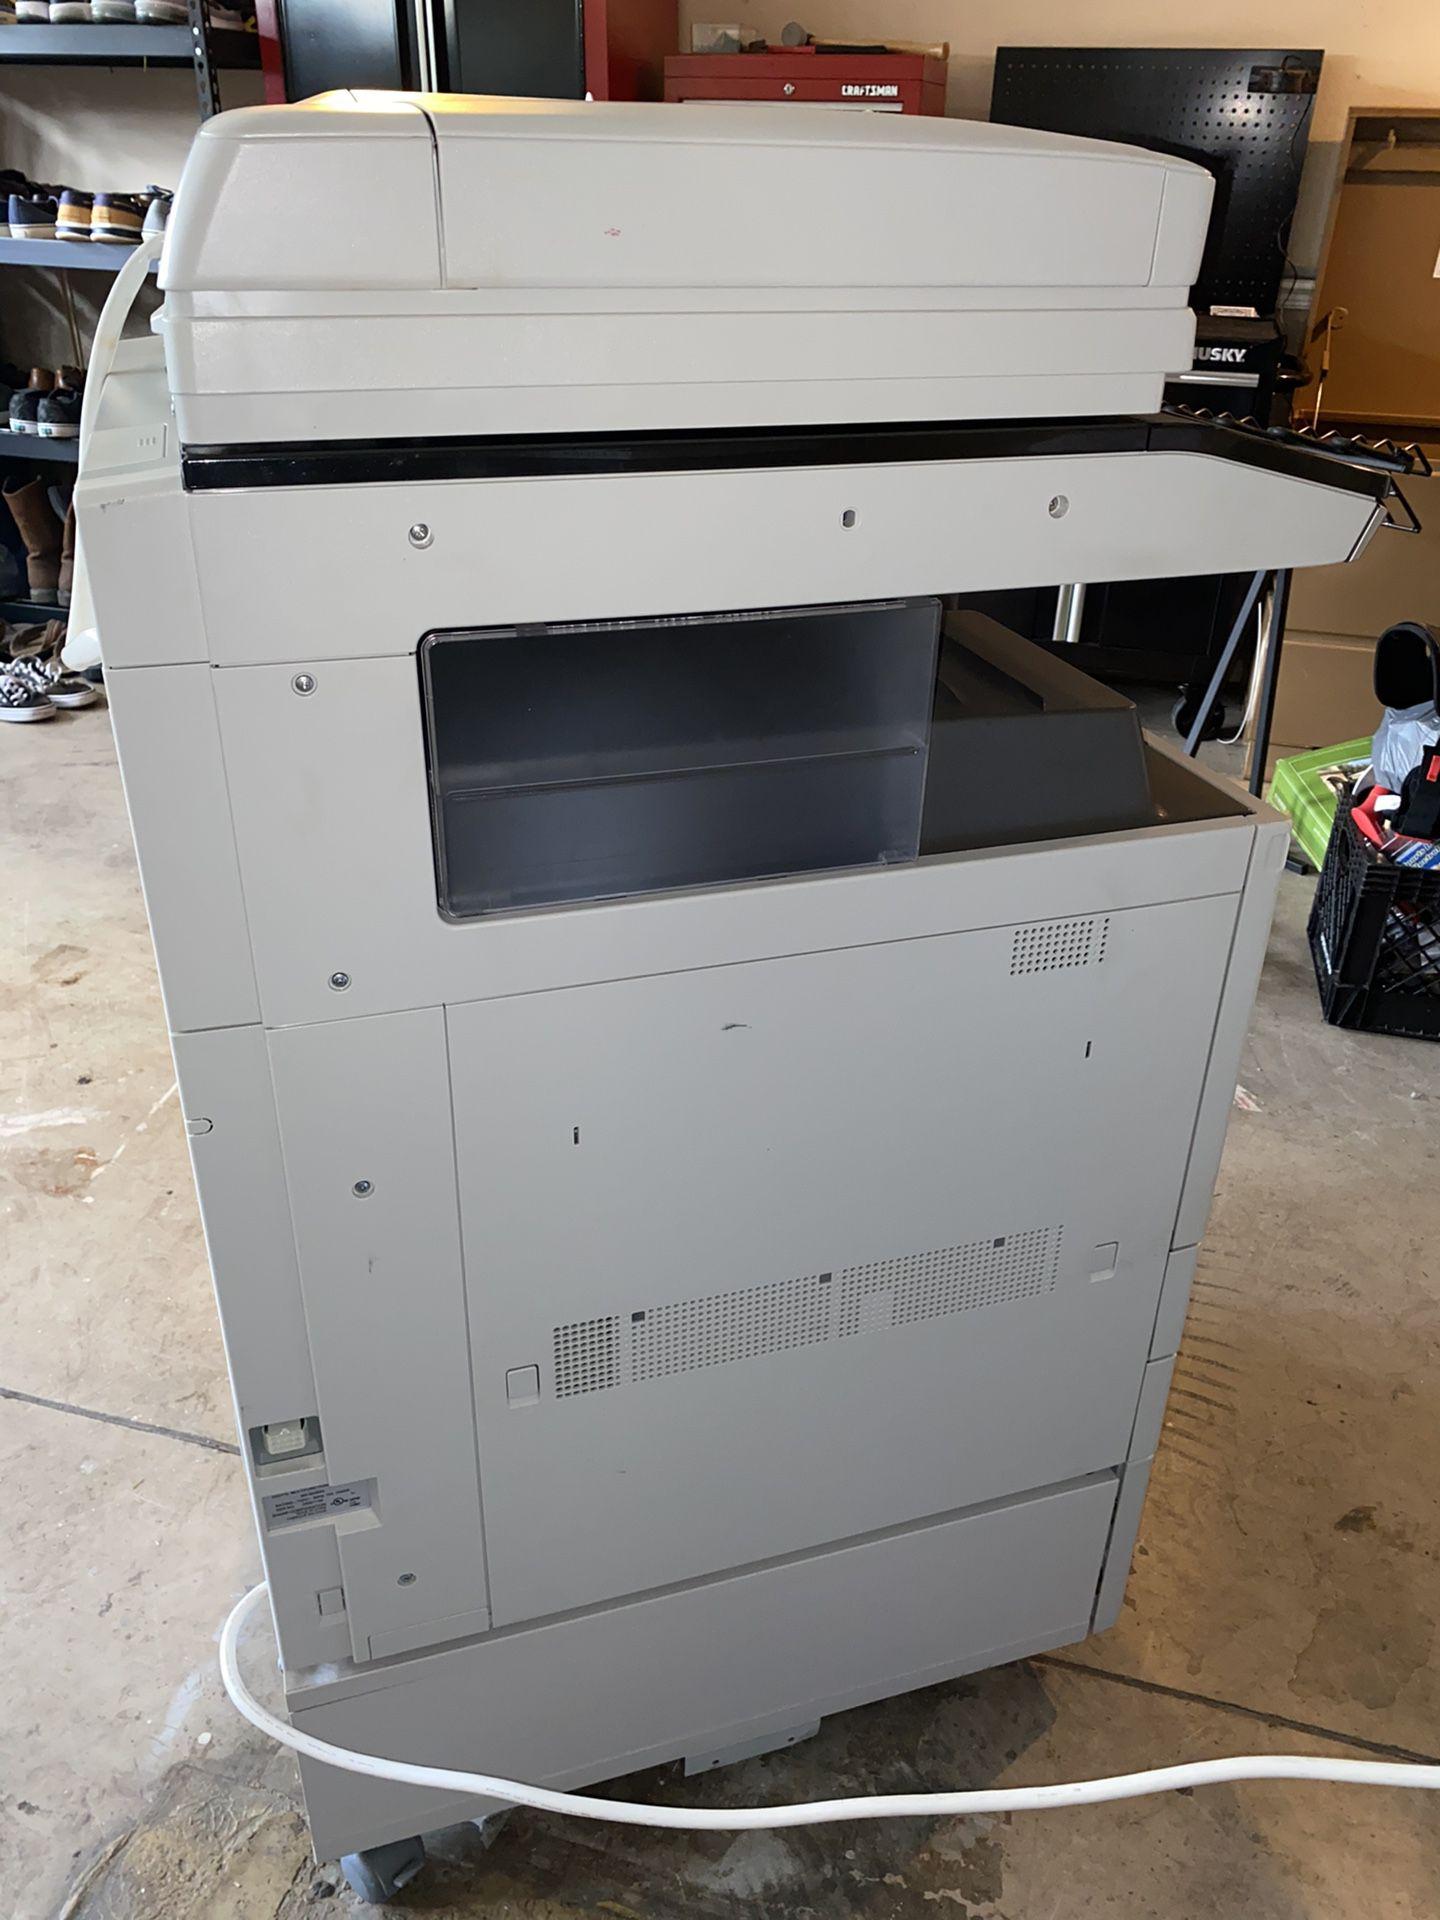 Sharp MX-M283N Office/Business Printer